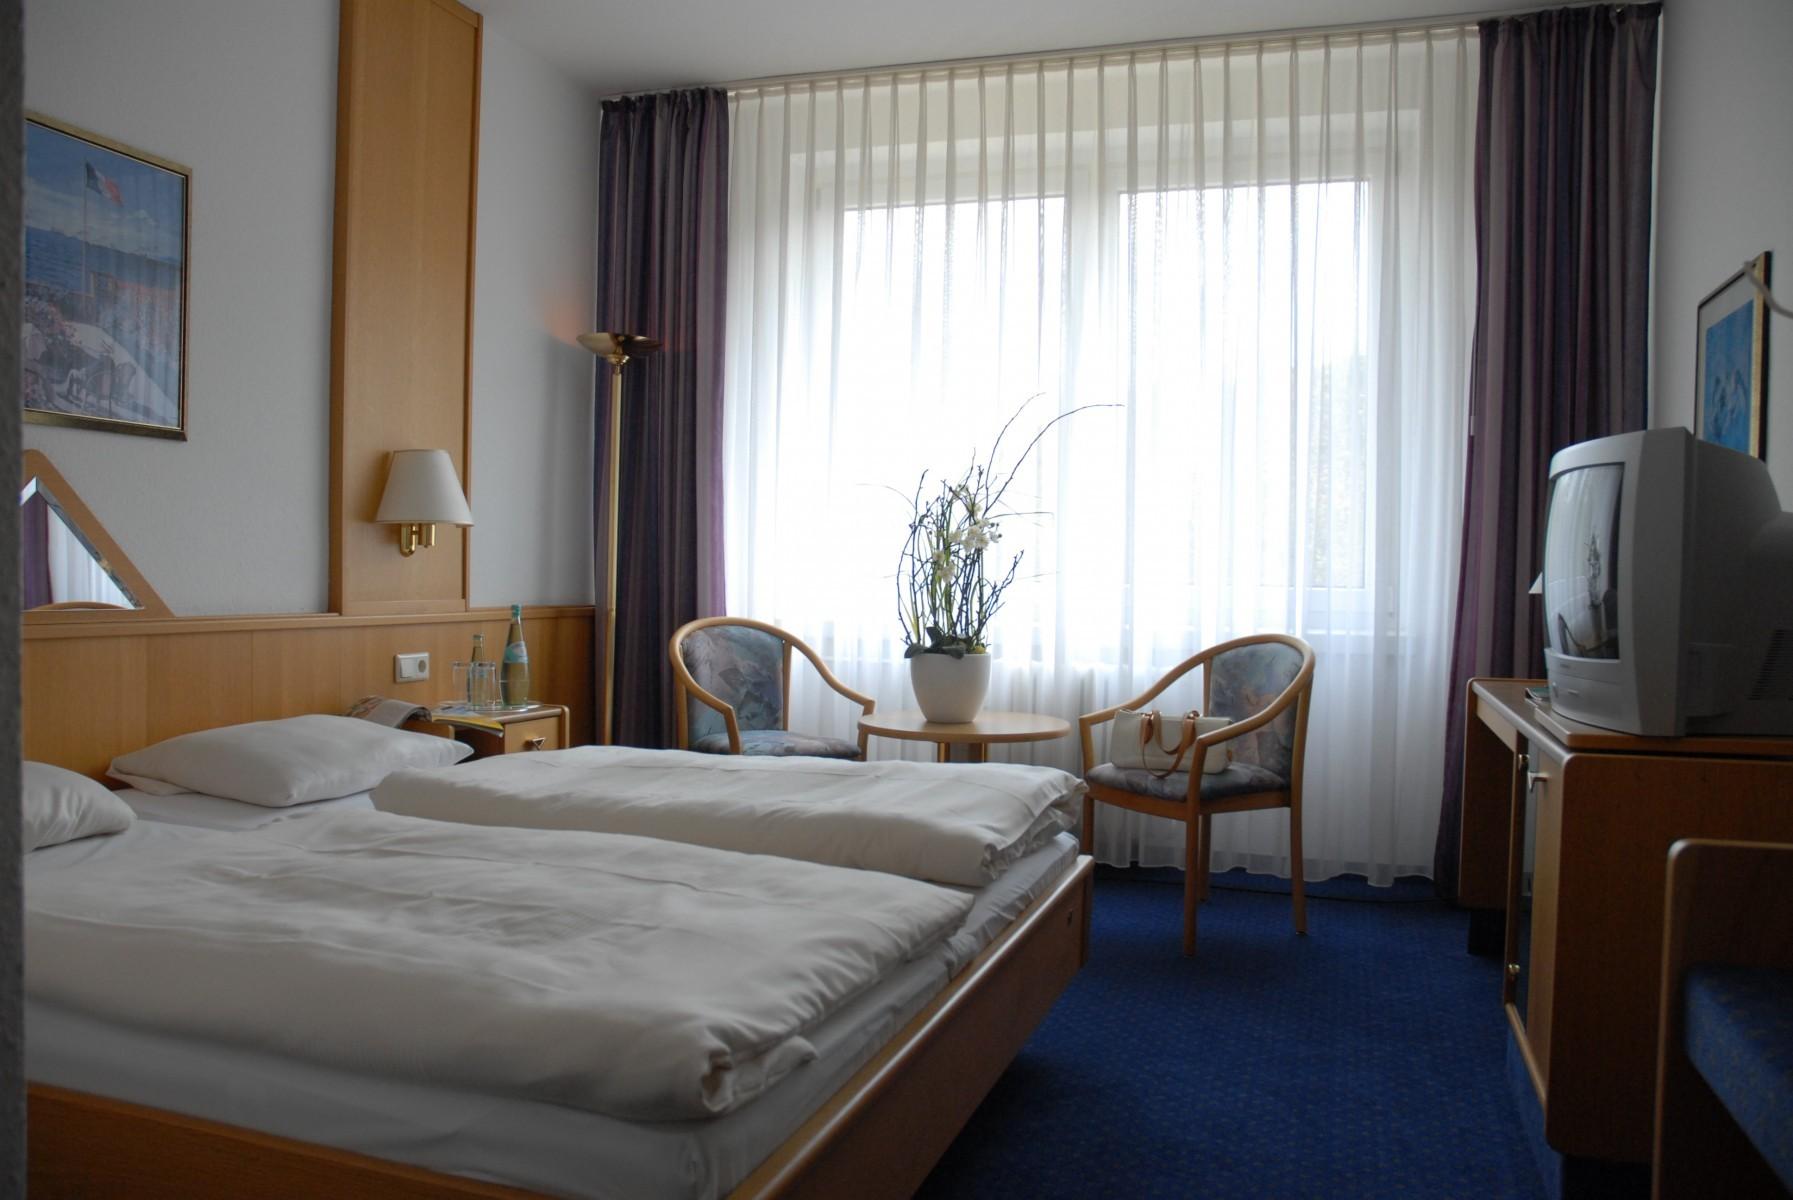 Kurzurlaub im Wellness-Hotel in Luisenthal Oberhof